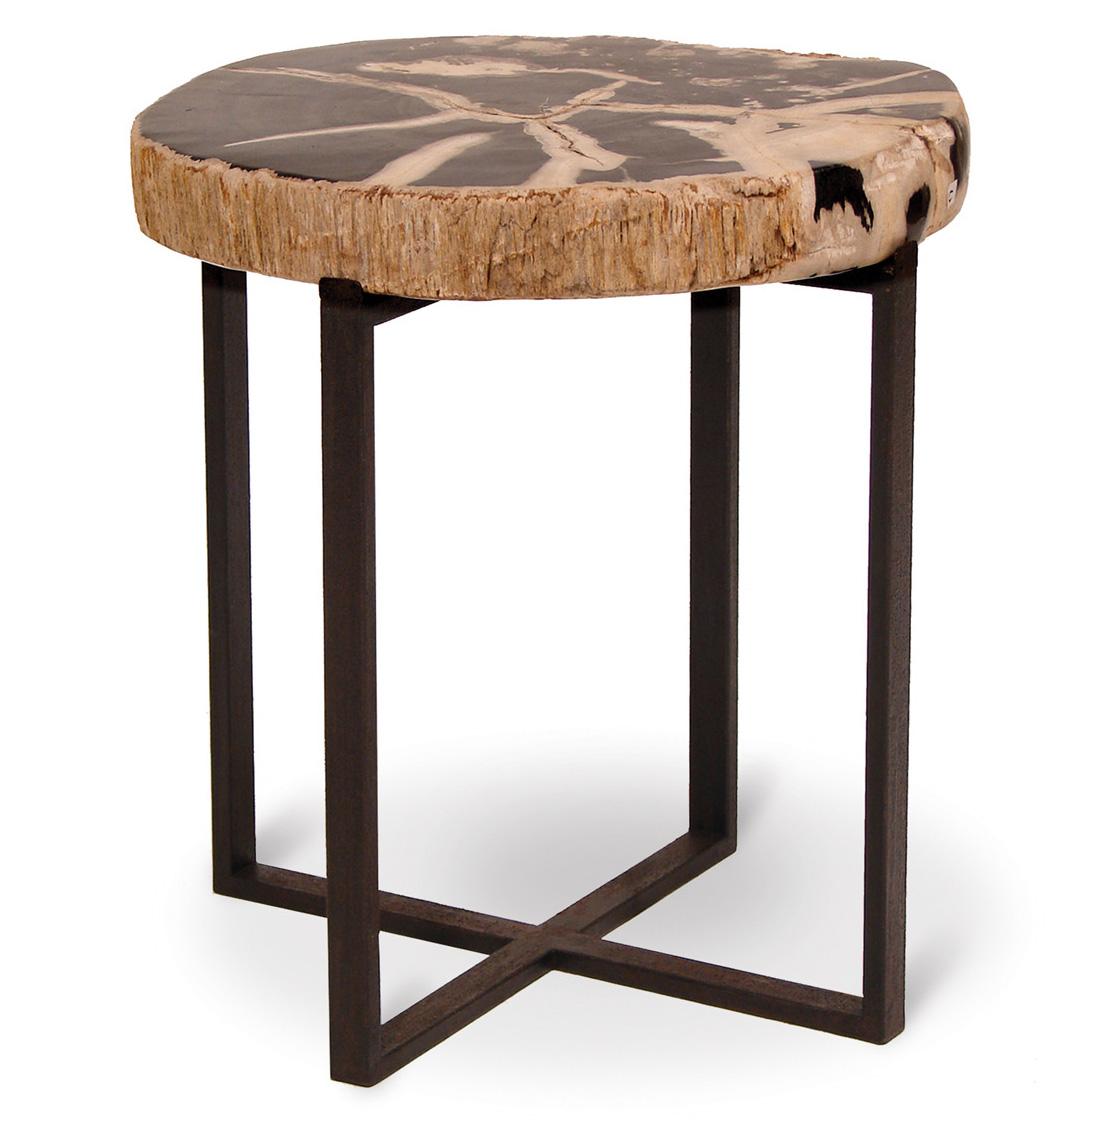 Noir Petrified Wood Industrial Loft Round Side Table - 18.5 Inch